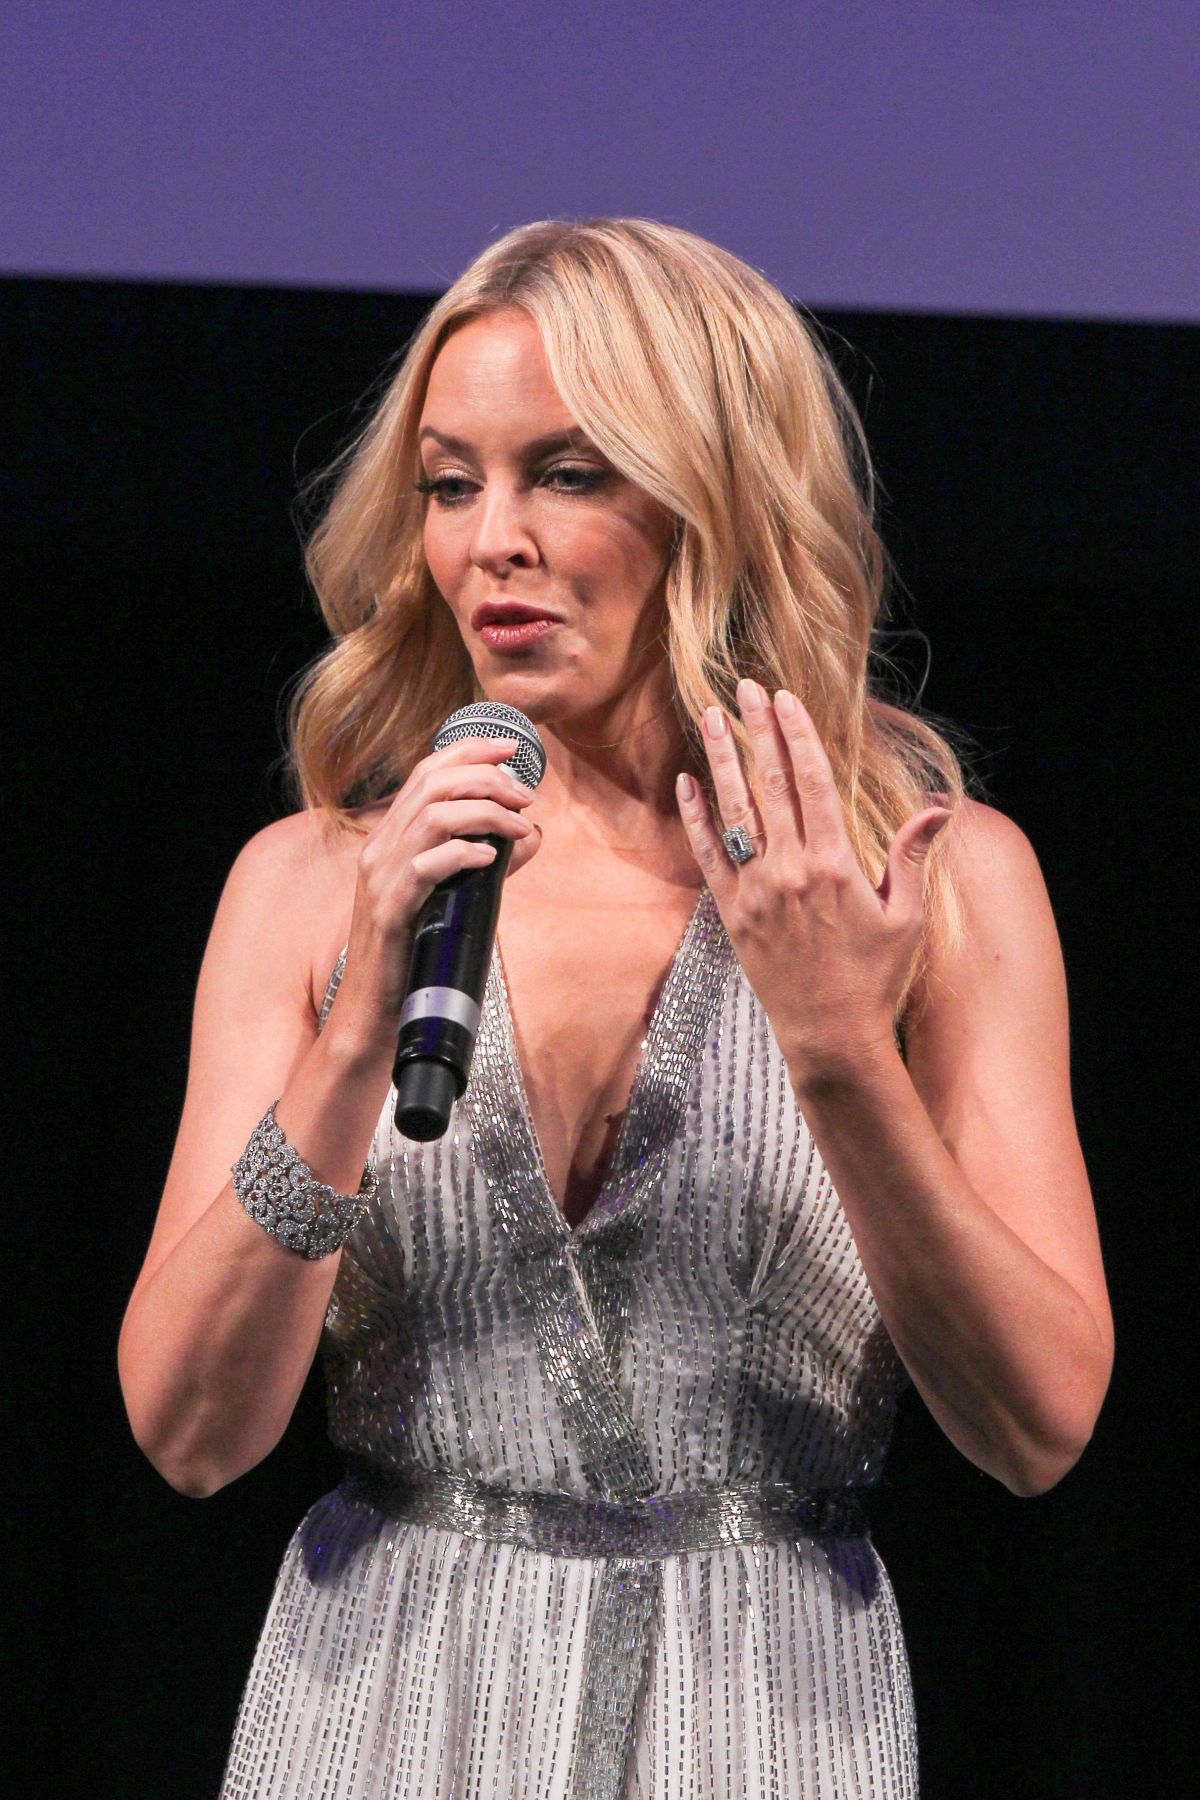 Kylie Minogue Archives - HawtCelebs - HawtCelebs Jessica Alba